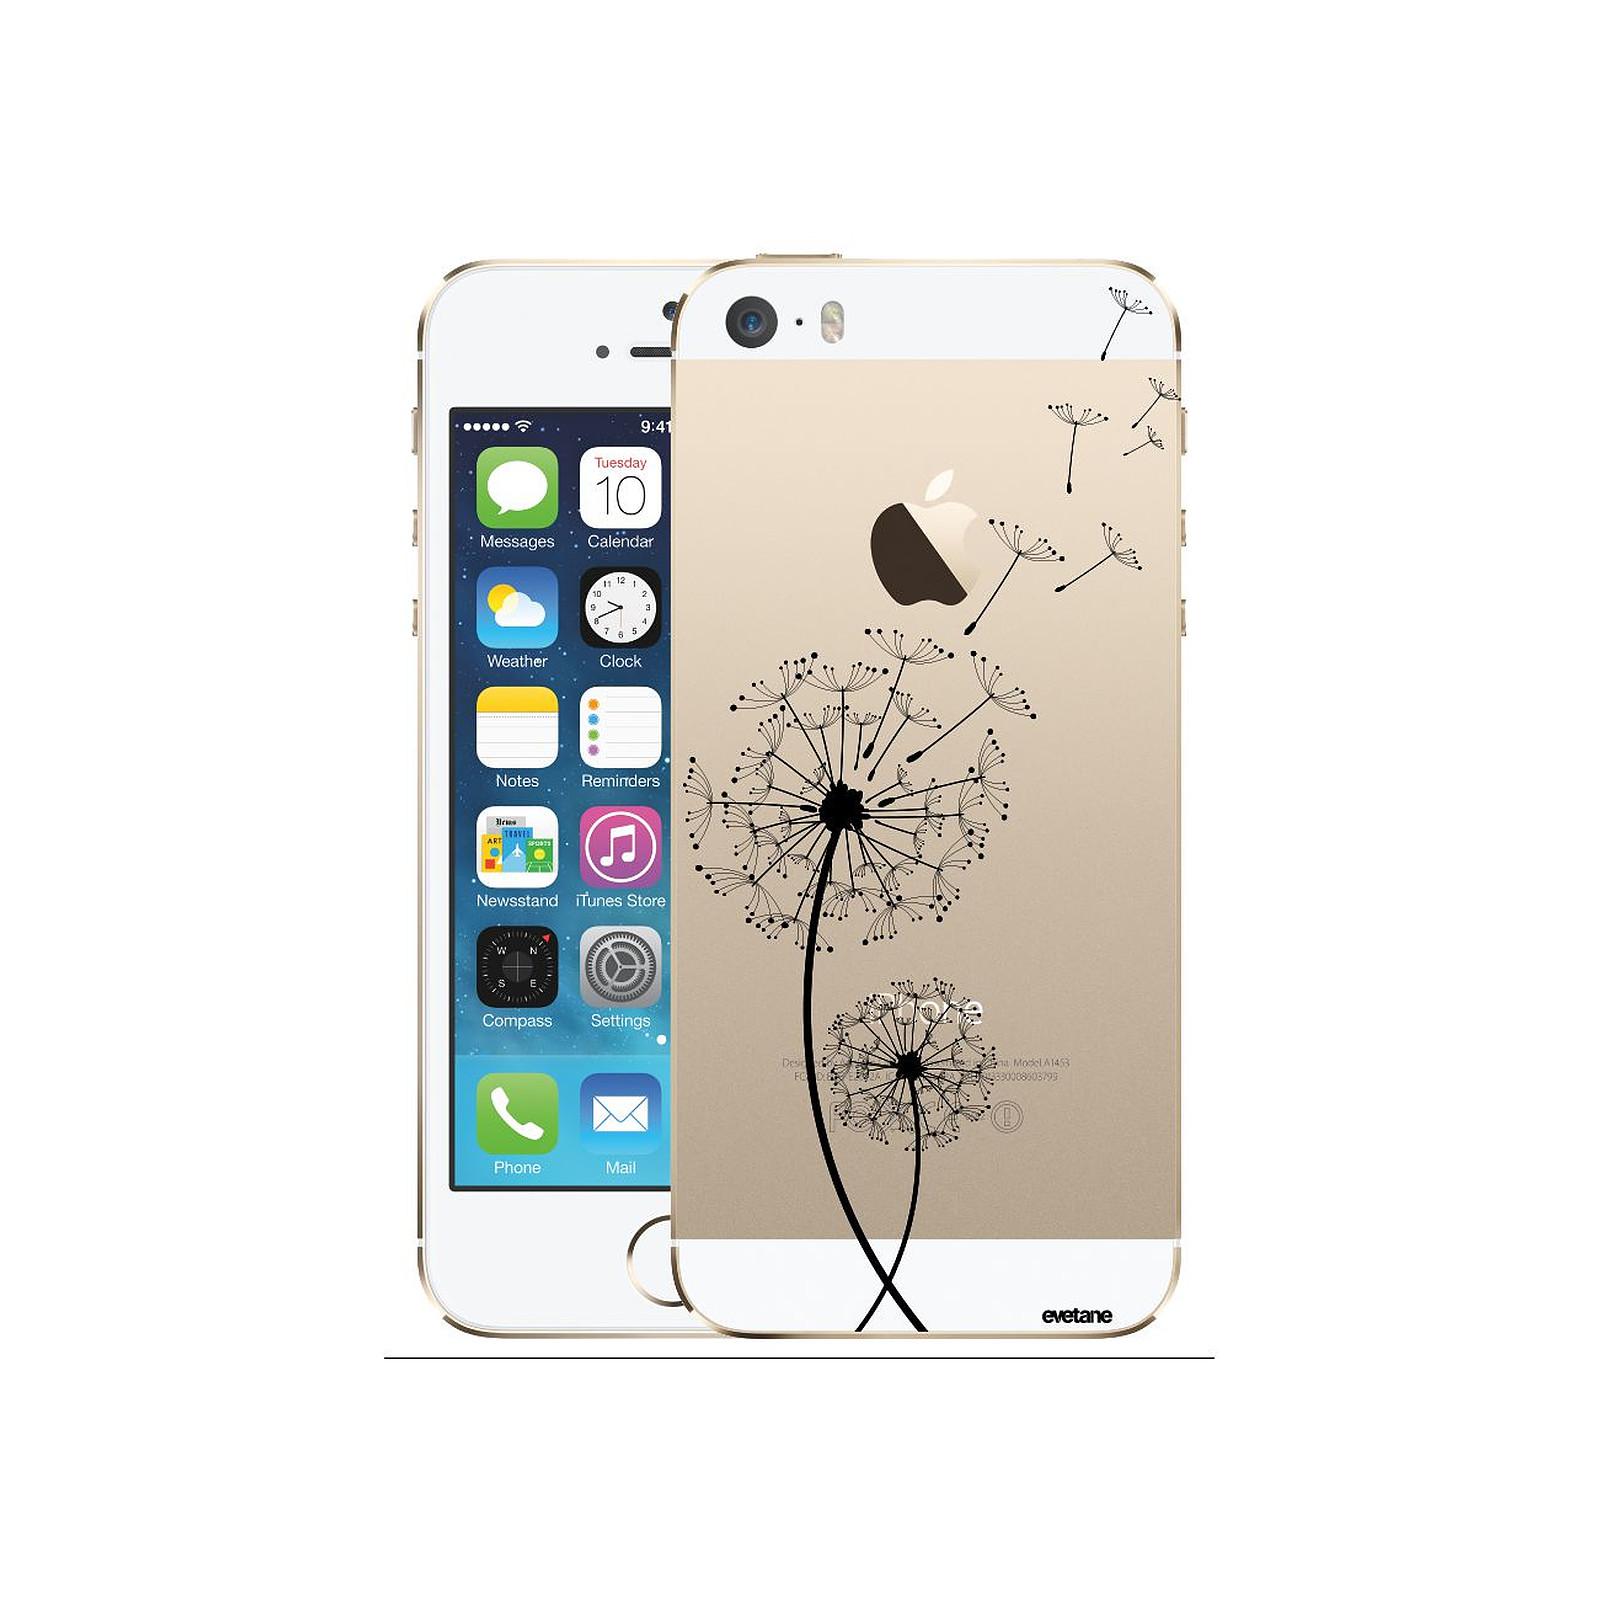 EVETANE Coque iPhone 5/5S/SE rigide transparente Pissenlit Dessin - Coque téléphone Evetane sur LDLC